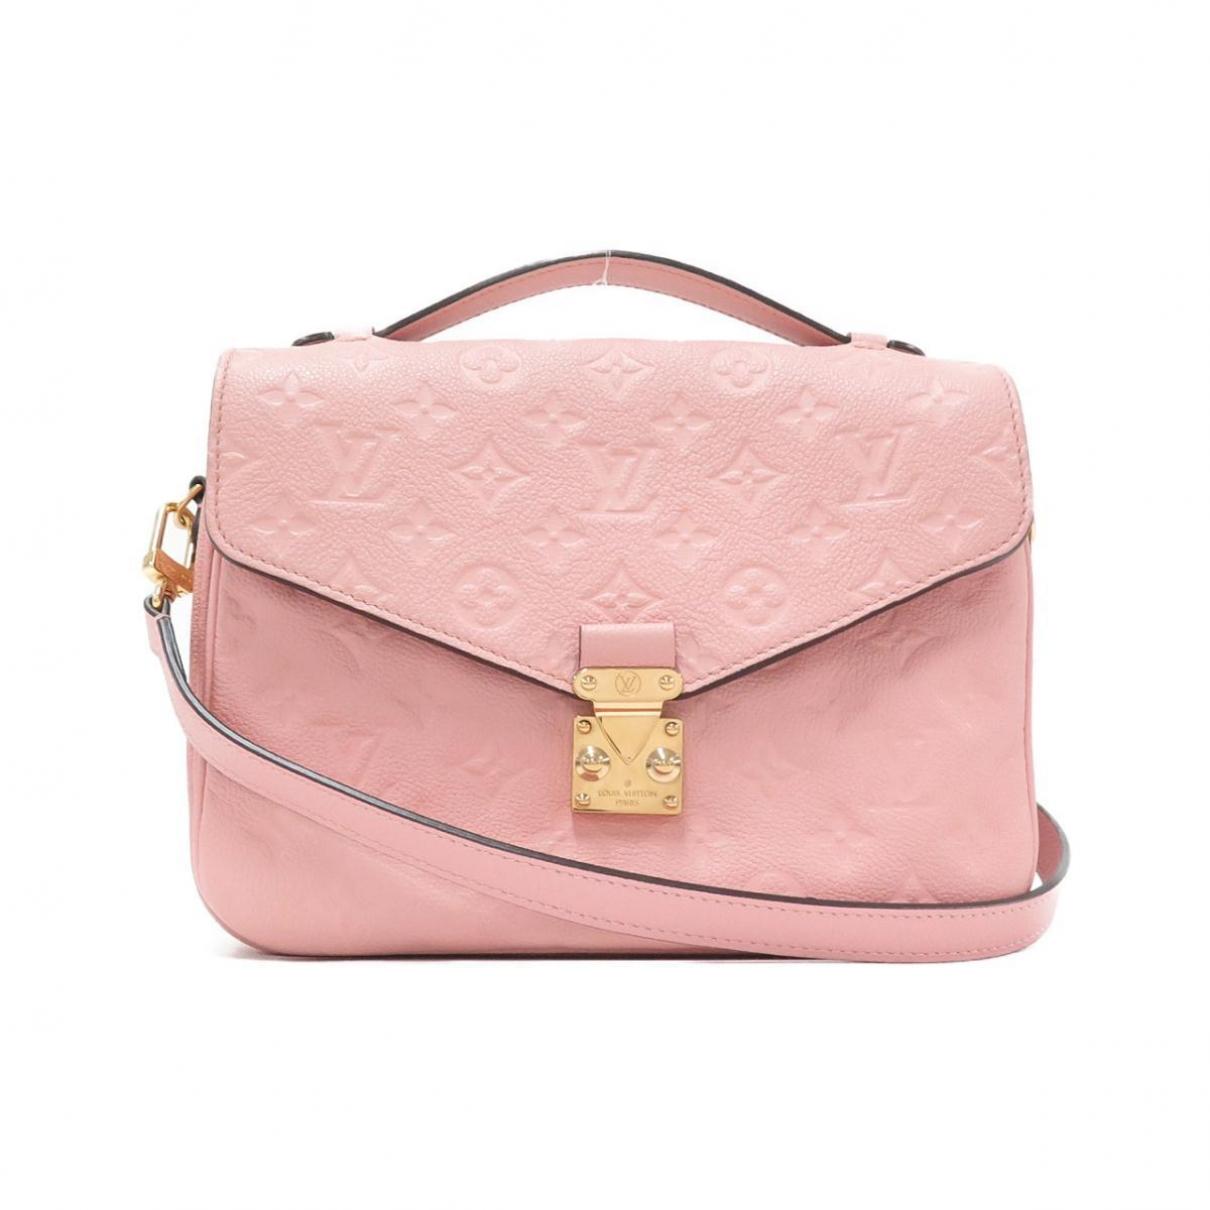 Louis Vuitton - Sac a main Metis pour femme en cuir - rose